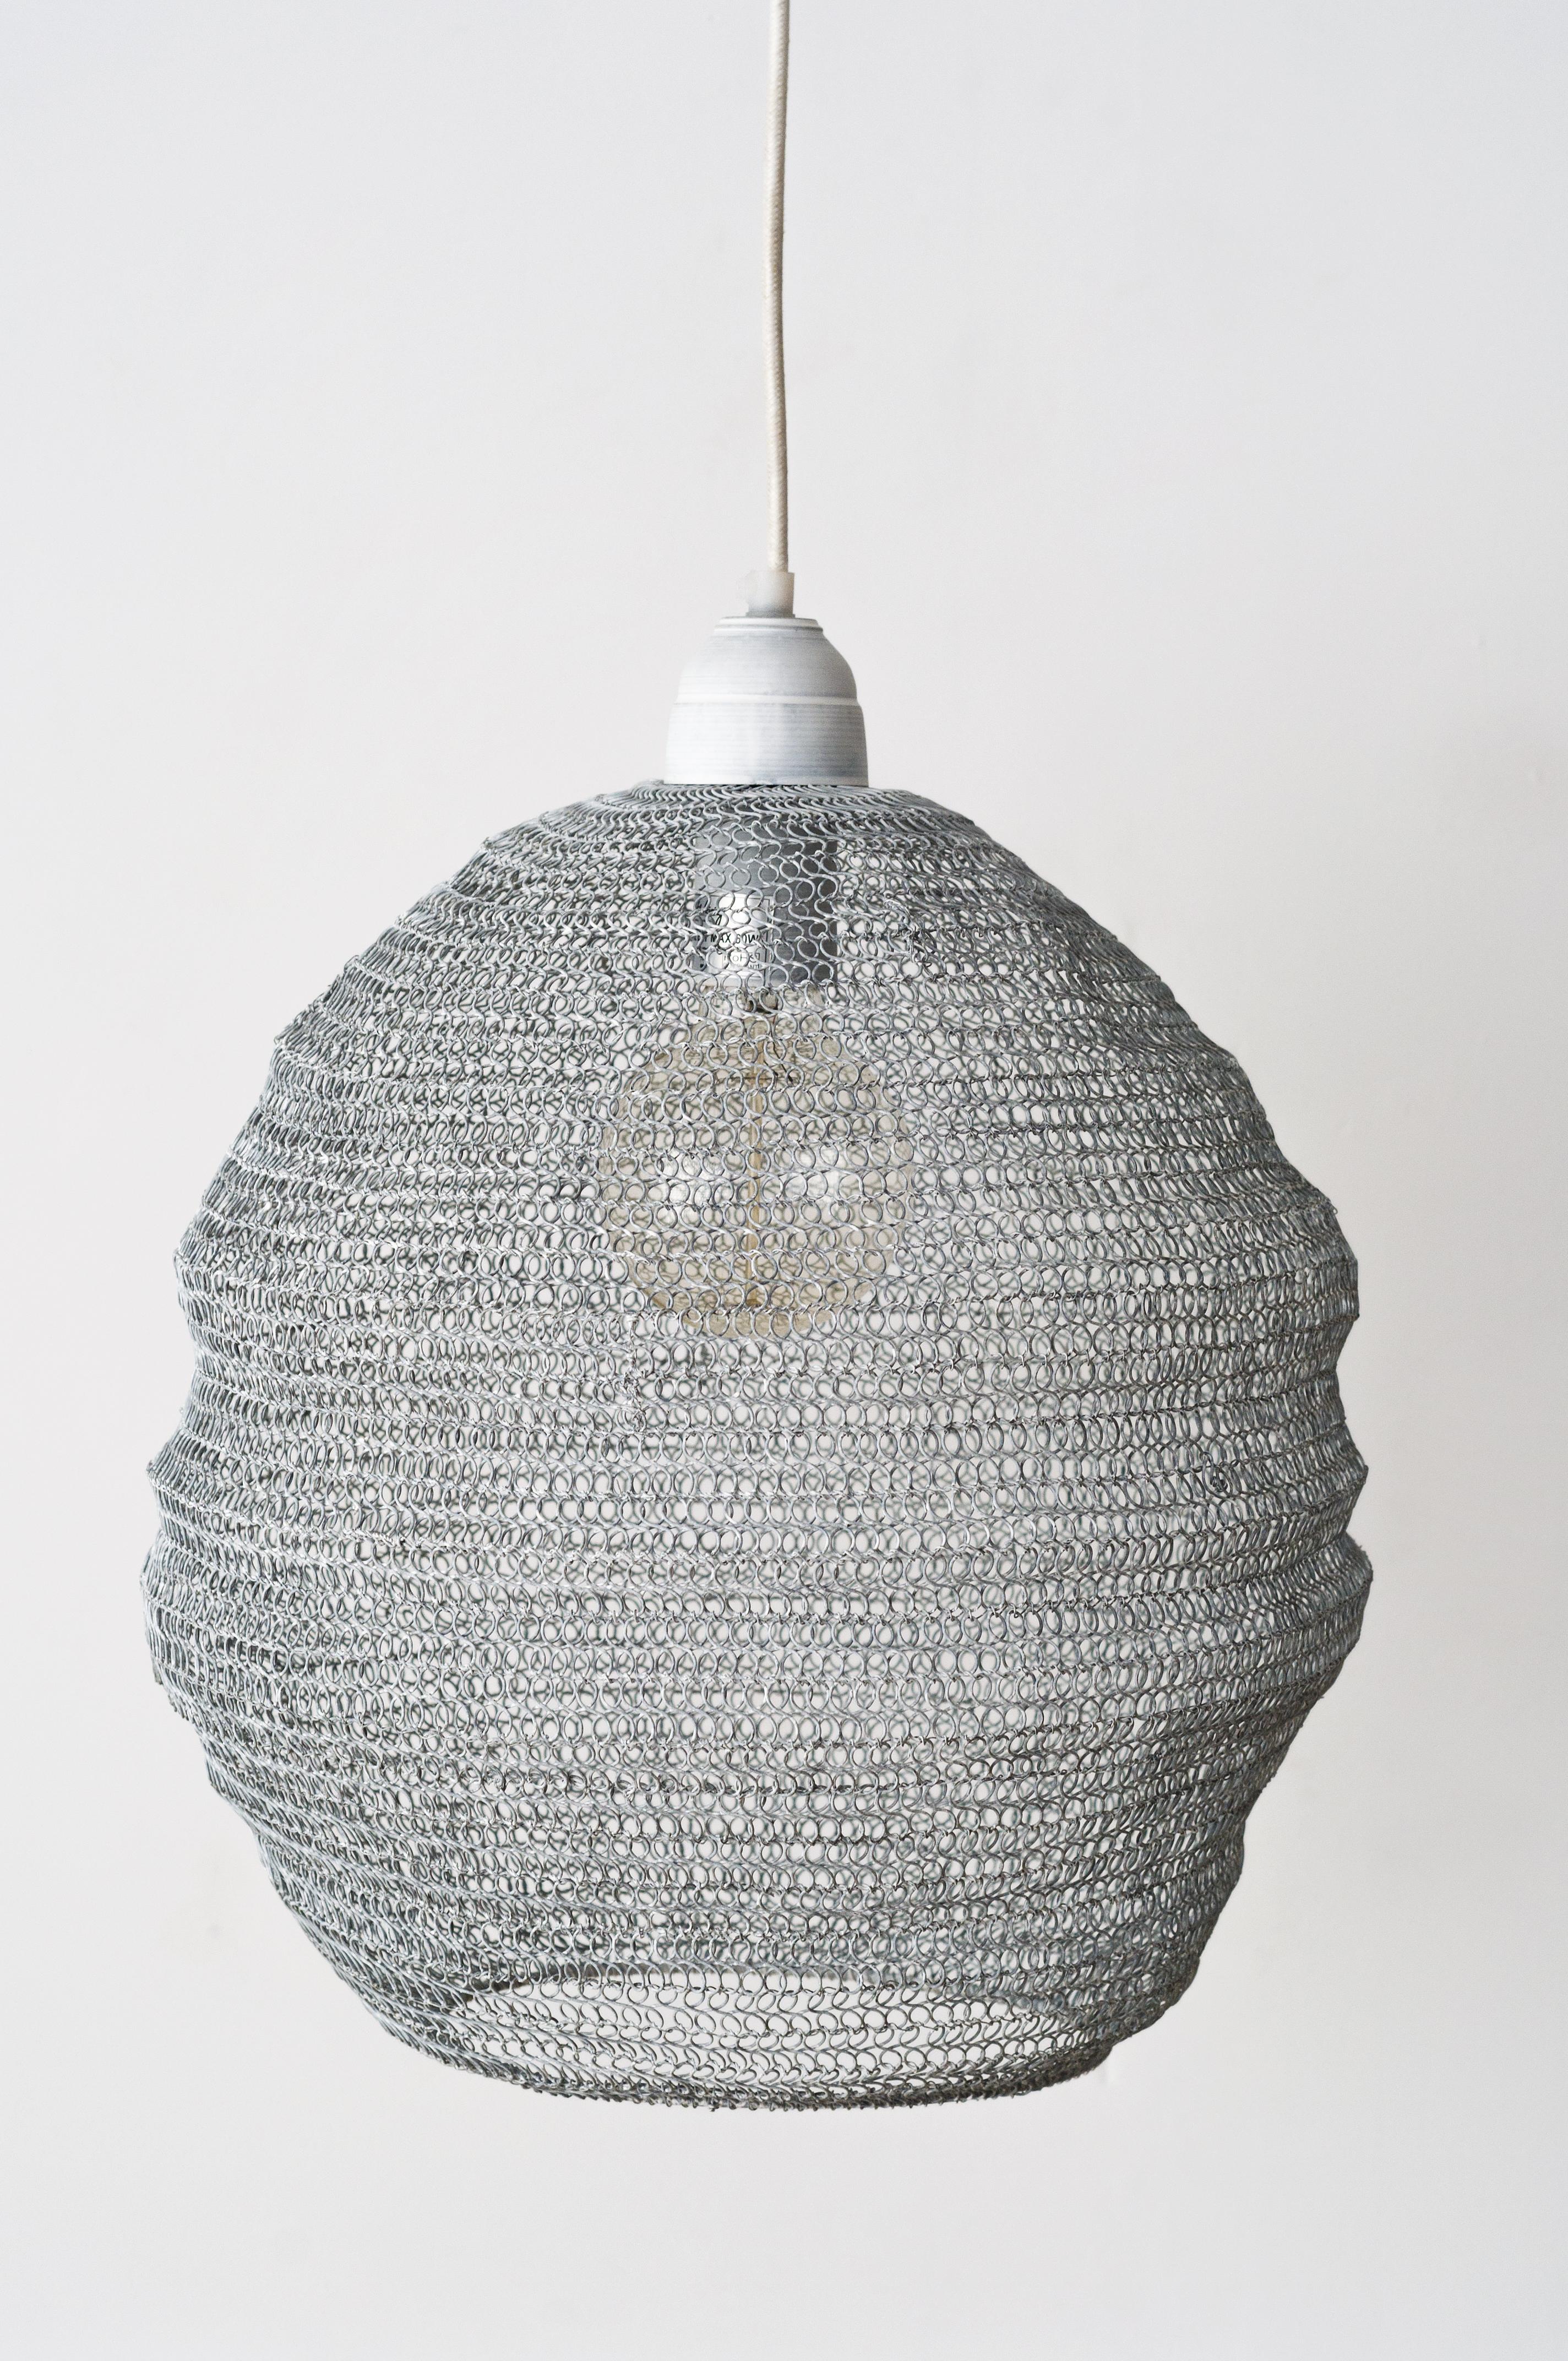 KLL-1068 Ani lampara de techo 02